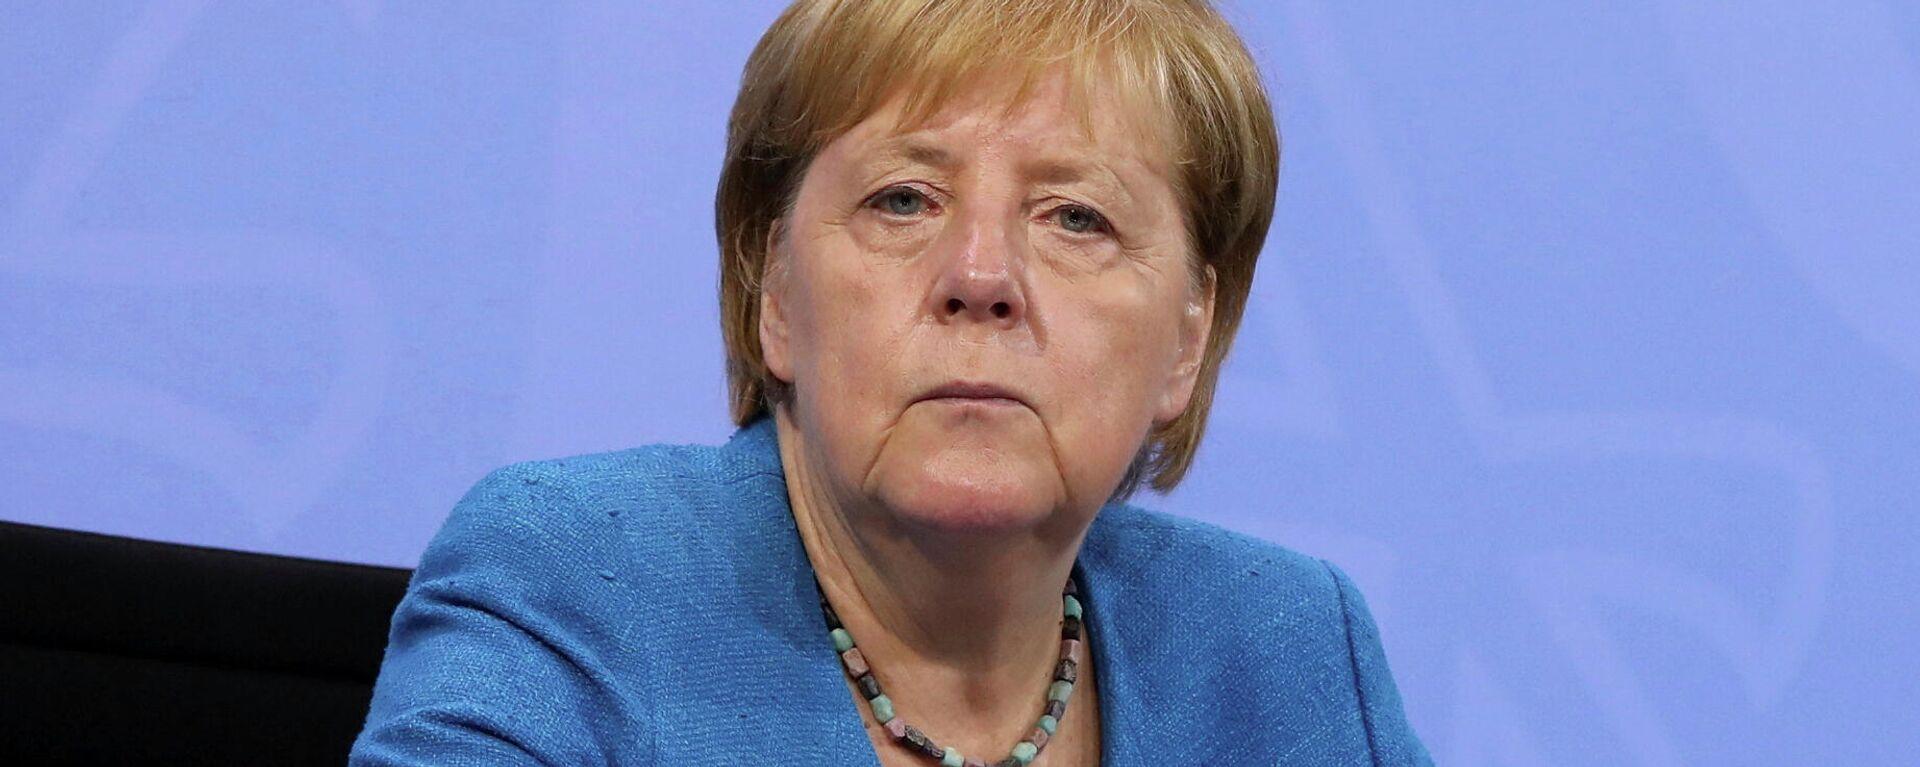 Noch-Bundeskanzlerin Angela Merkel. Berlin, 10. August 2021 - SNA, 1920, 16.08.2021